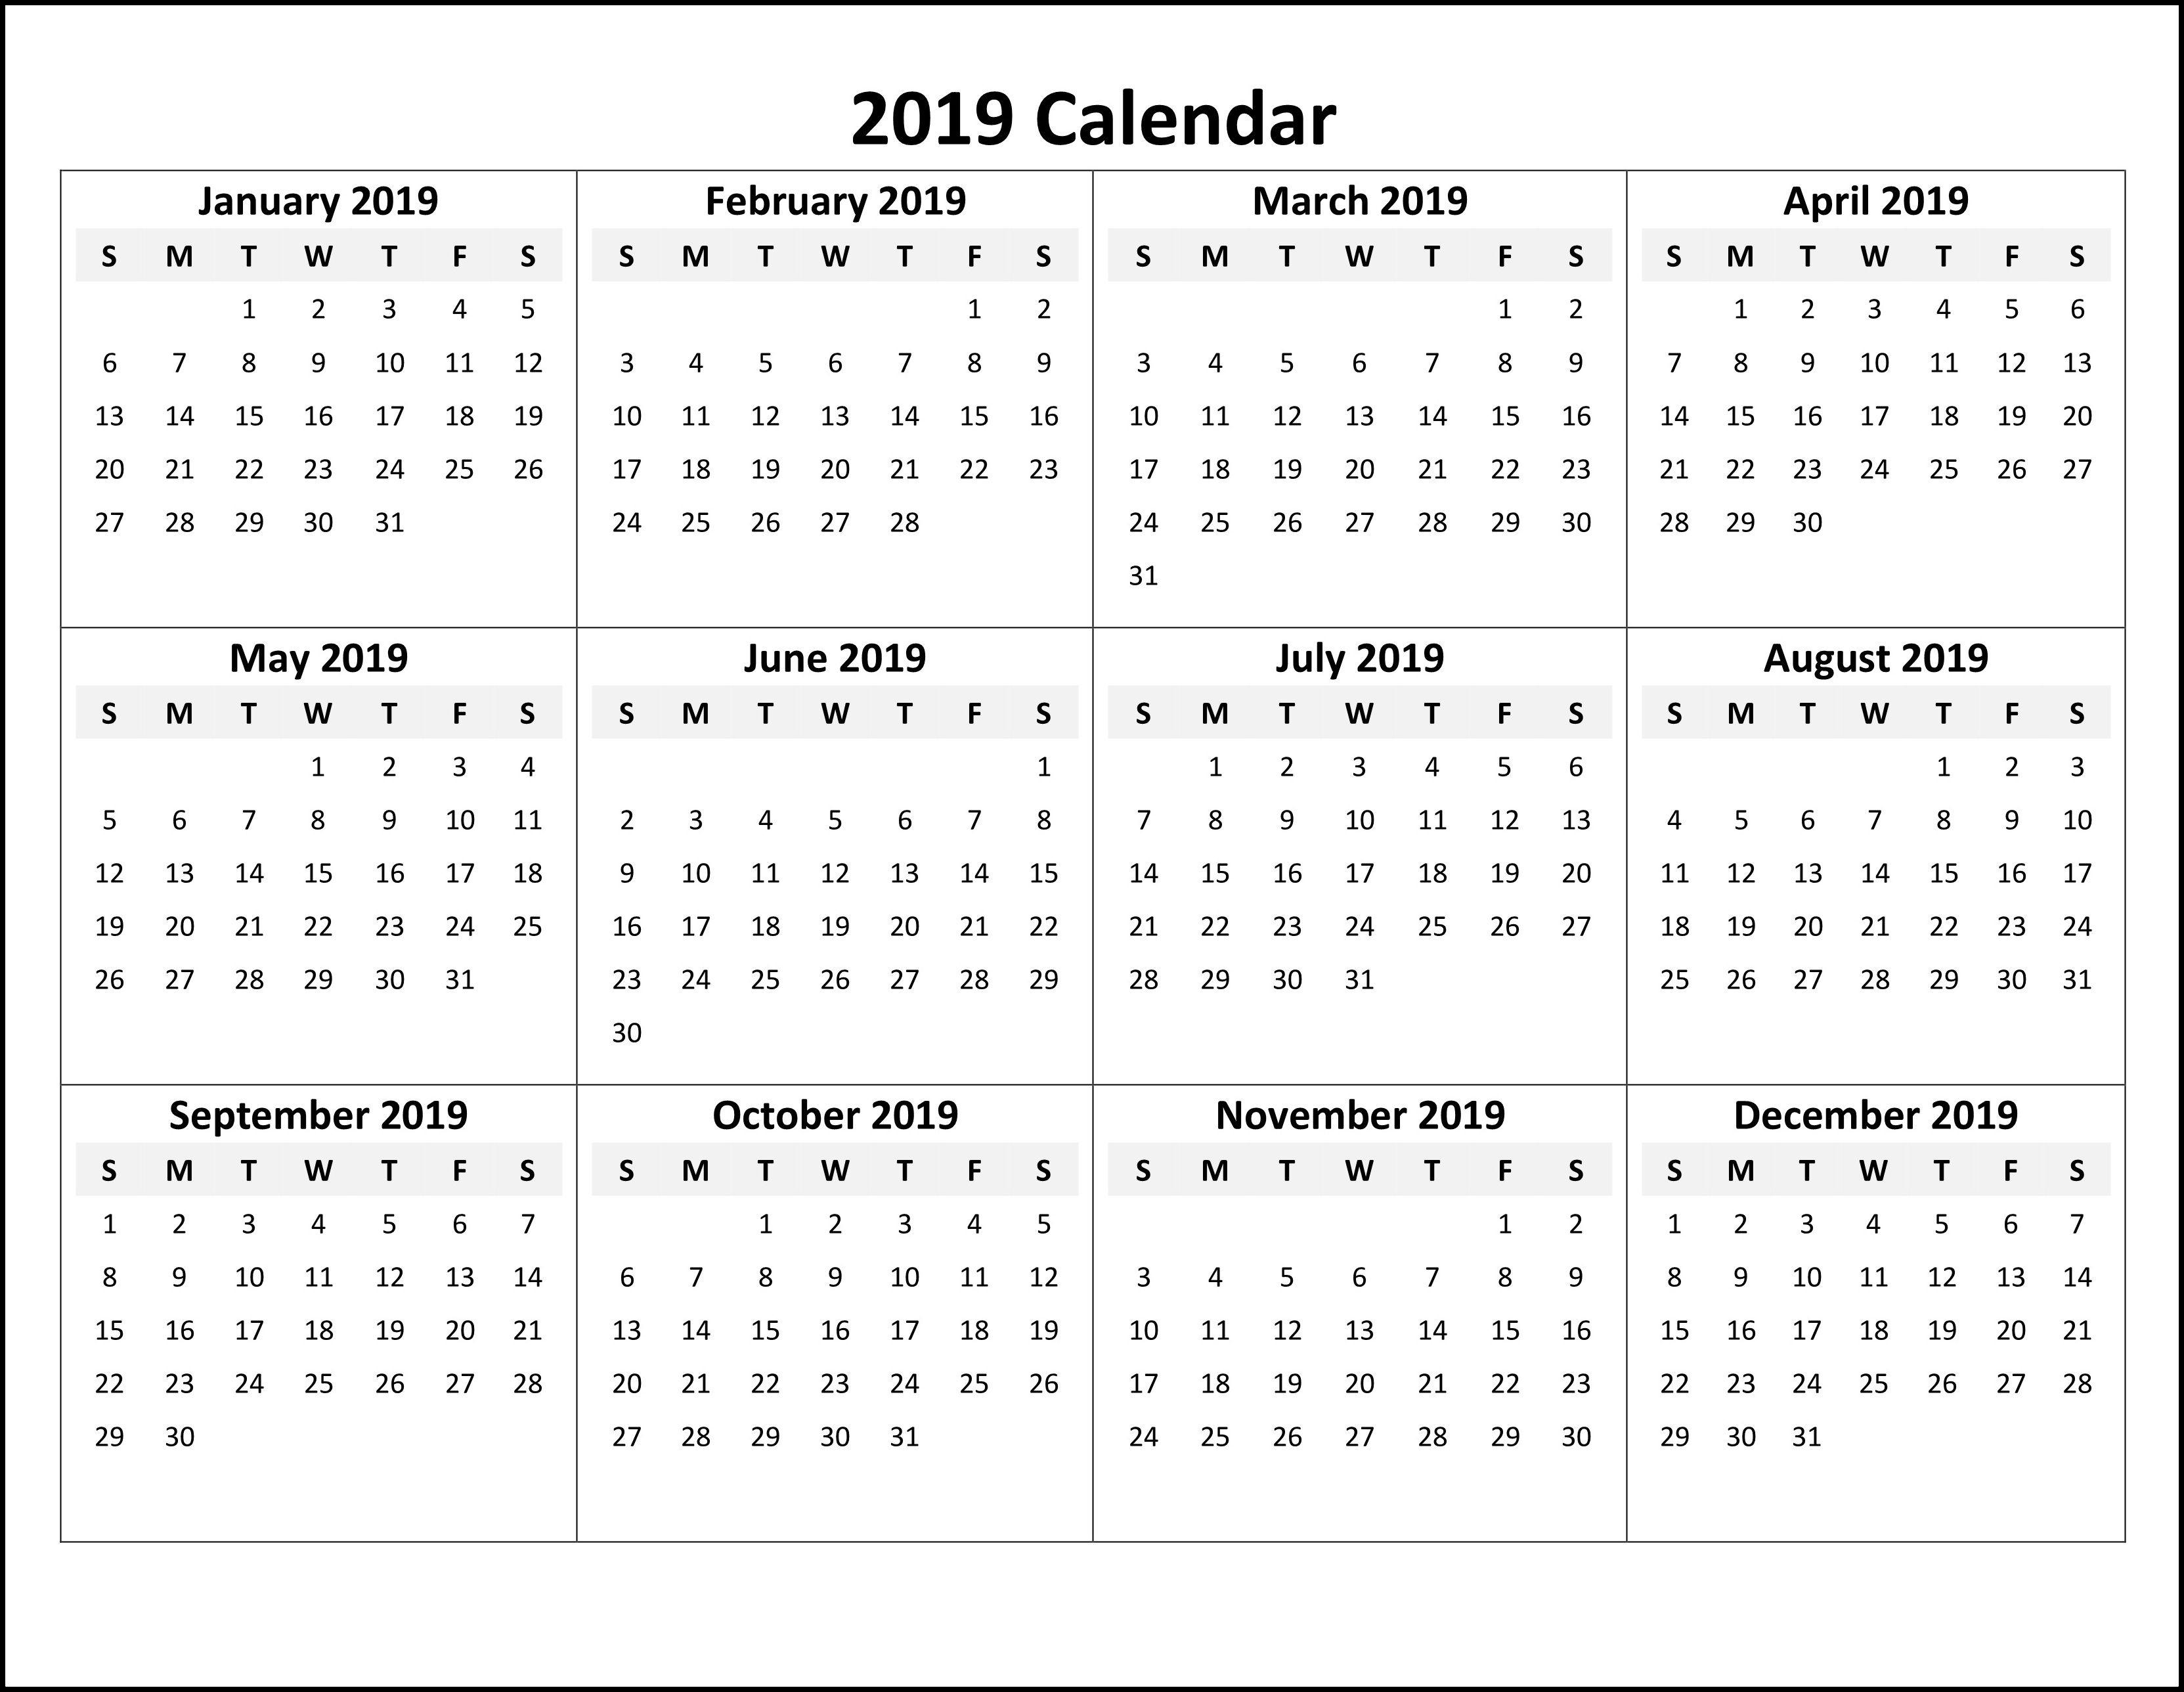 Free Printable Online Calendar - Wpa.wpart.co